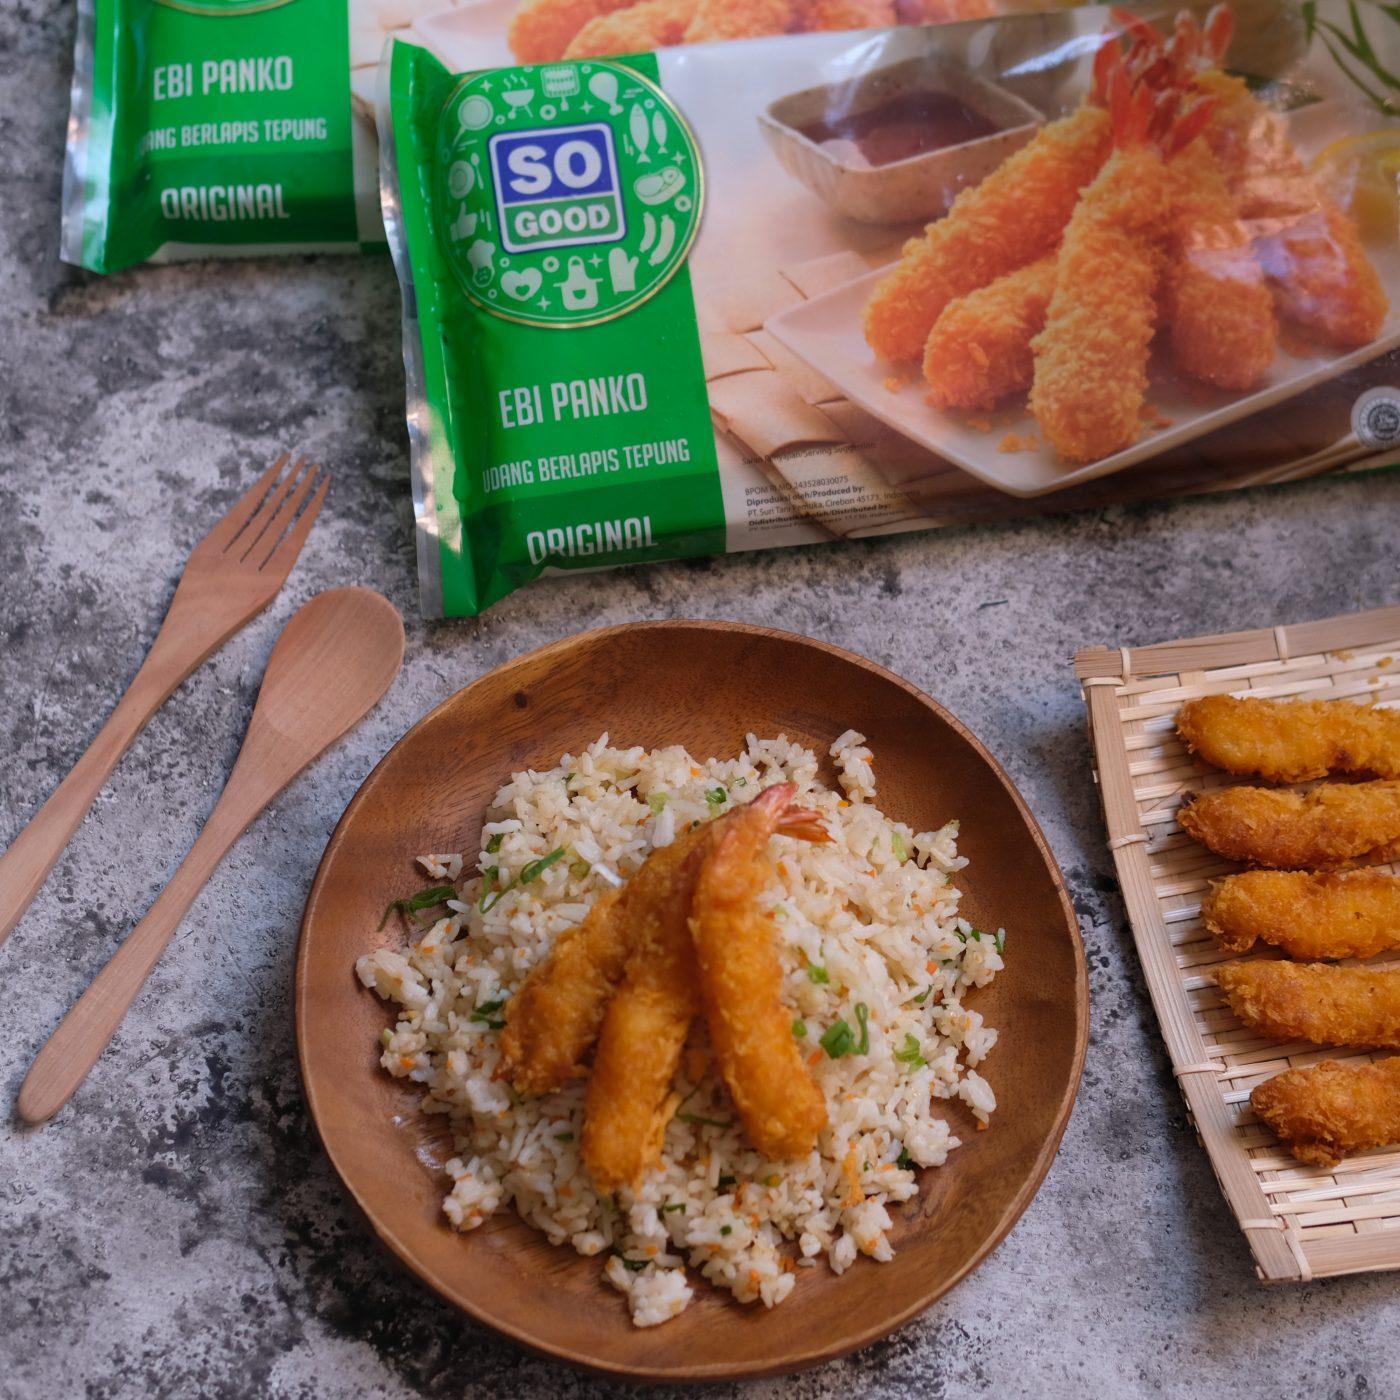 Image Garlic Butter Rice with Ebi Panko